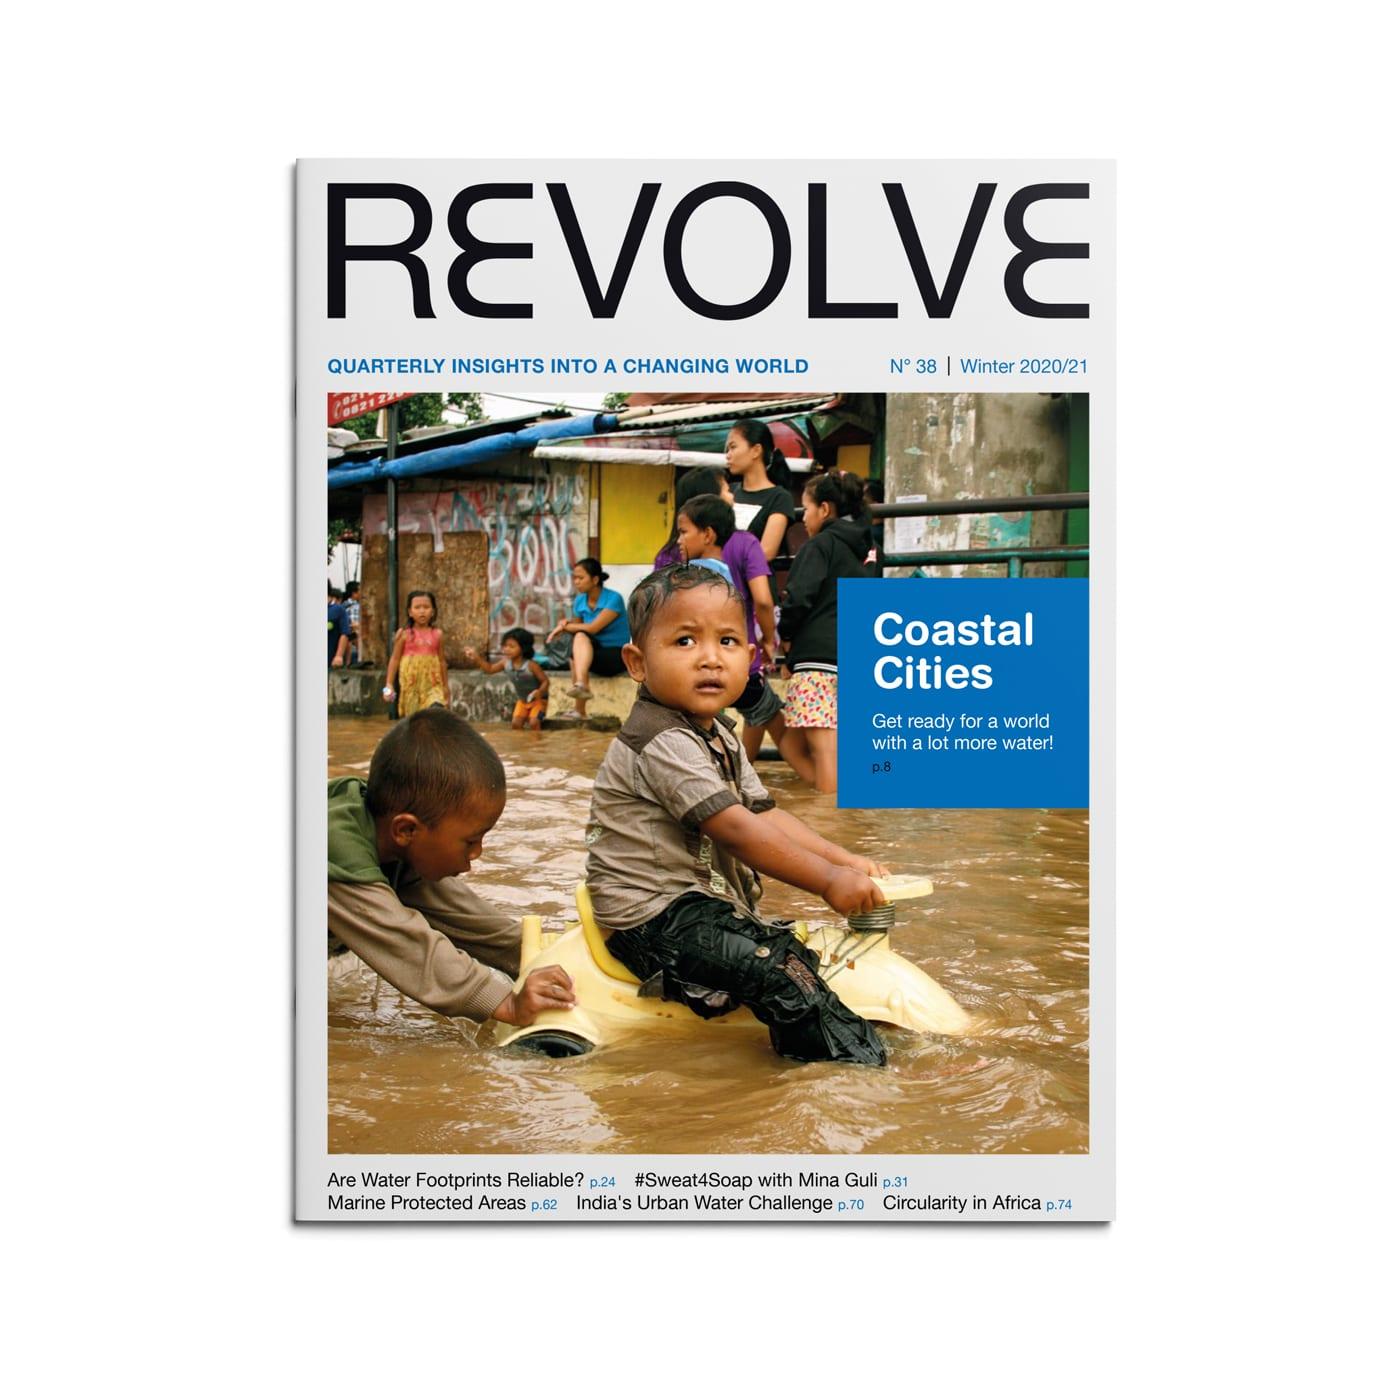 REVOLVE Magazine 38